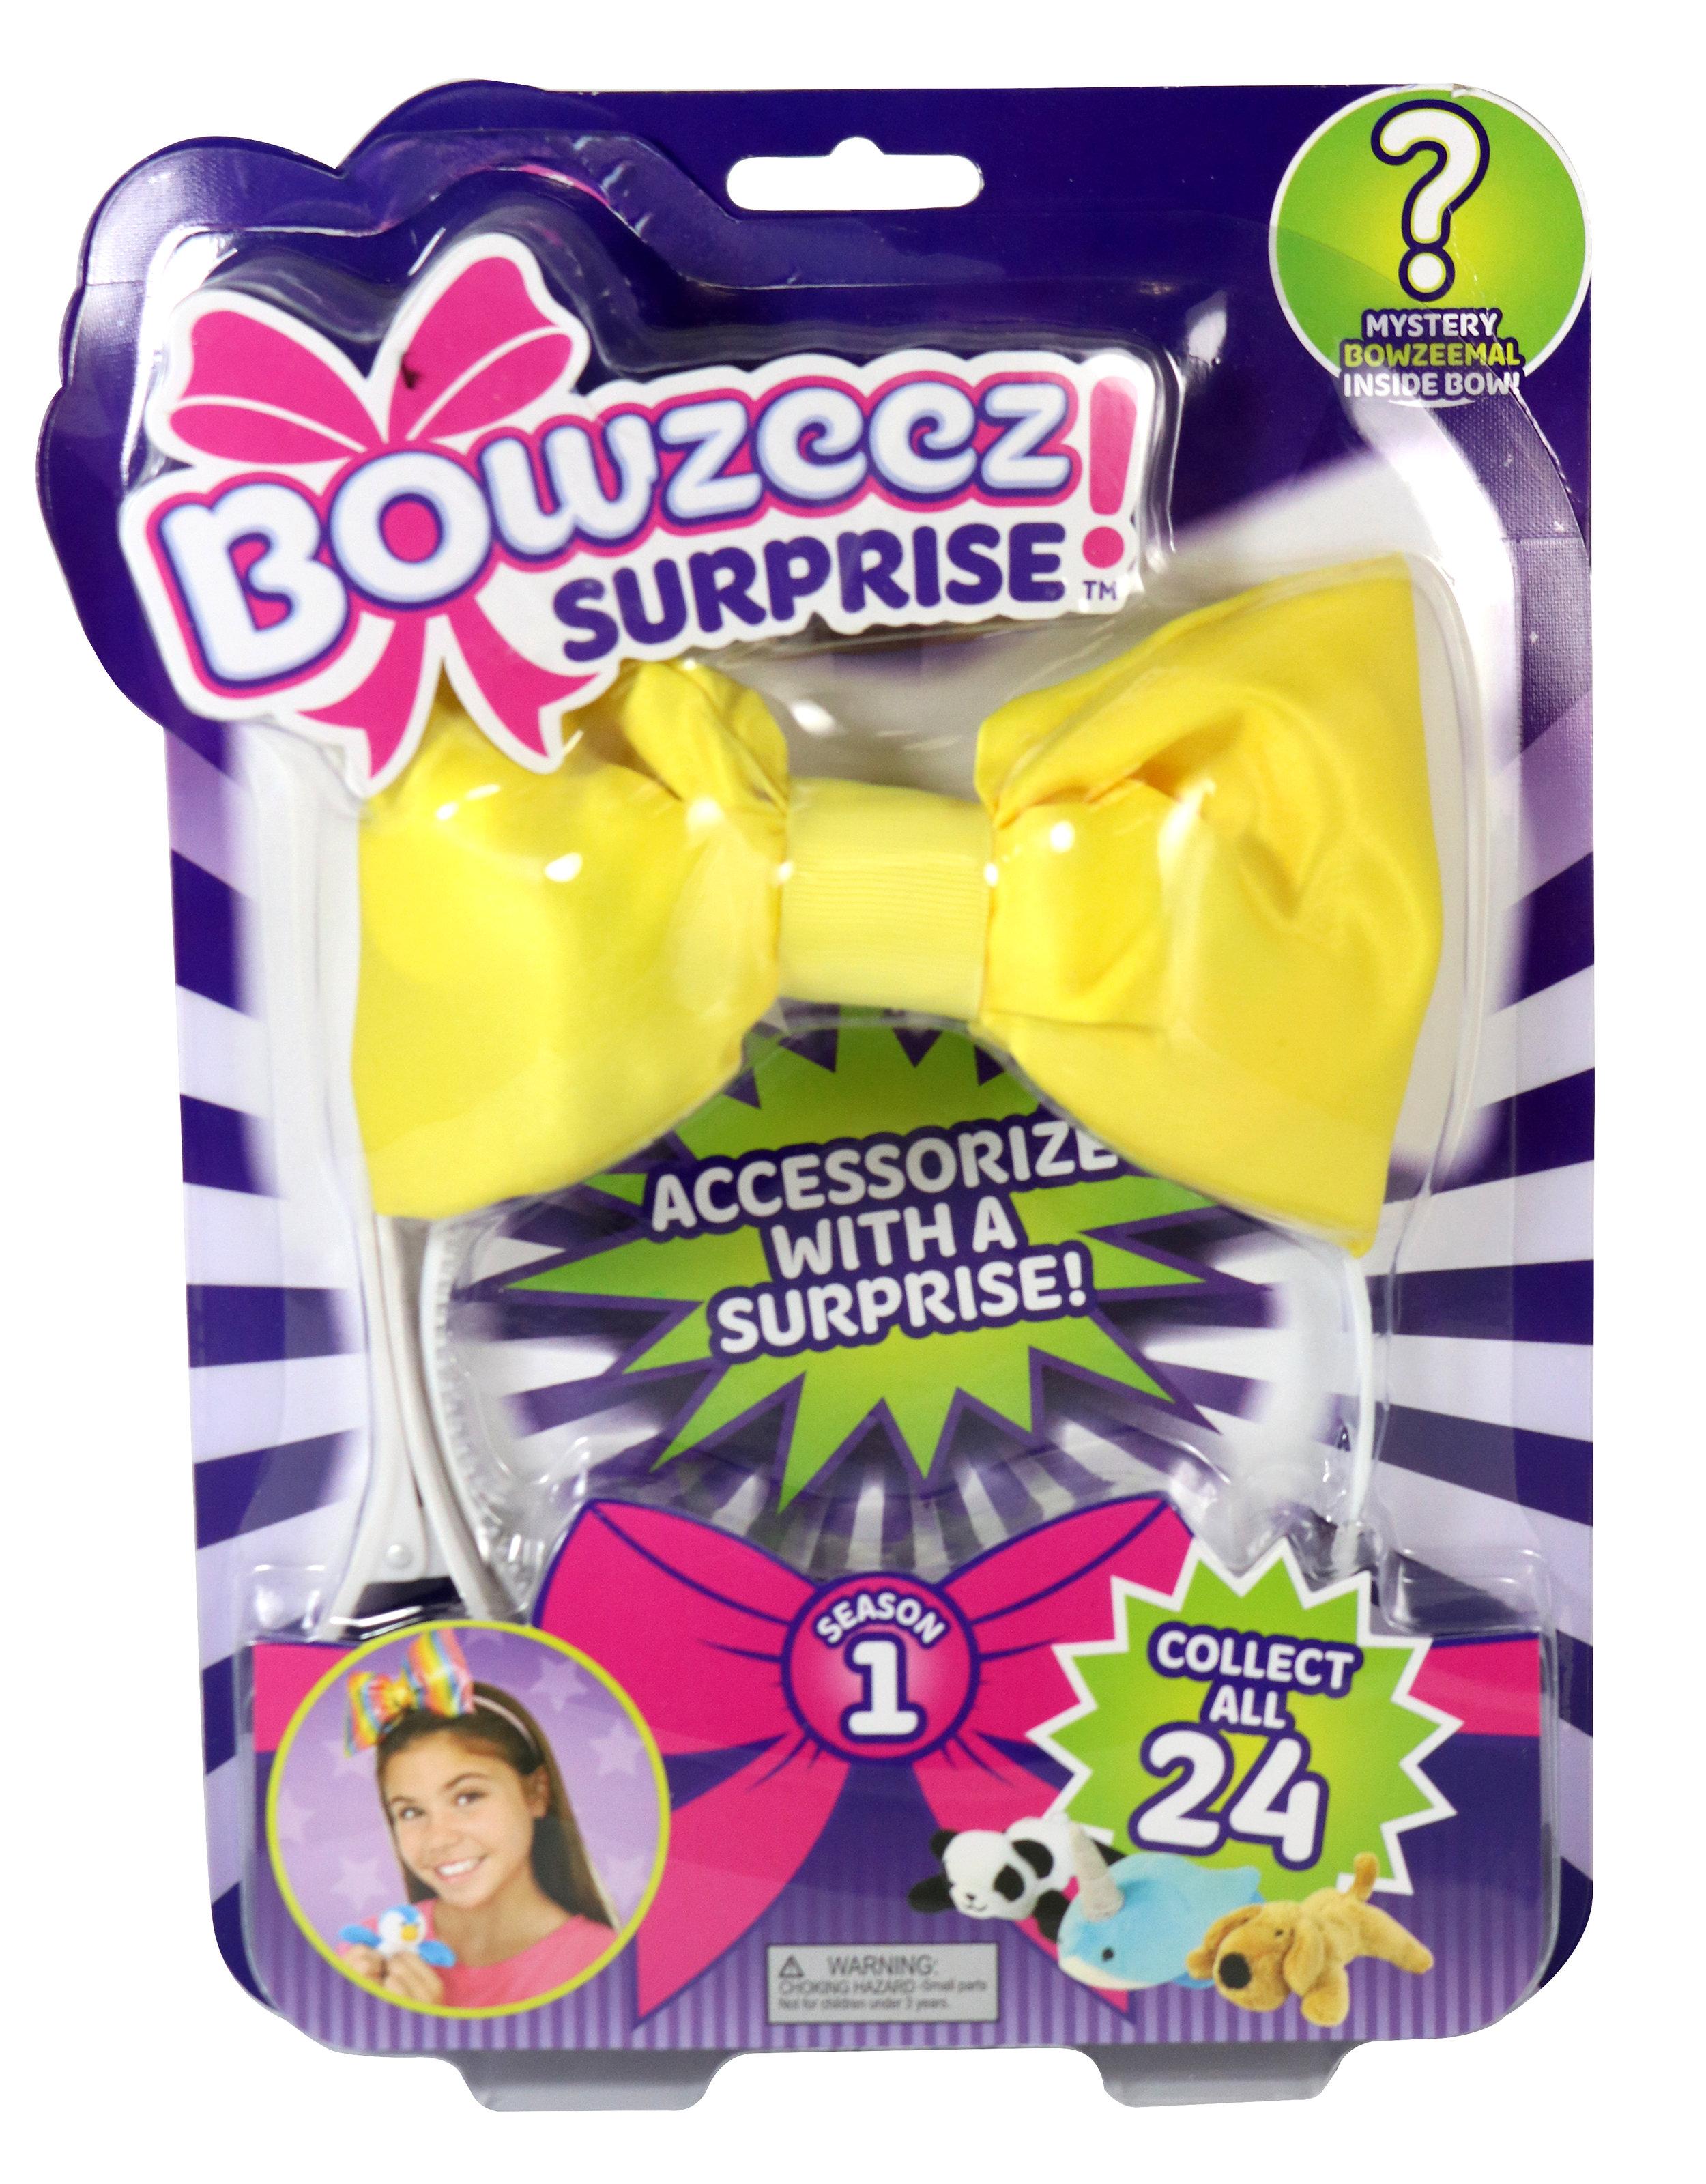 Bowzeez_Yellow.jpg